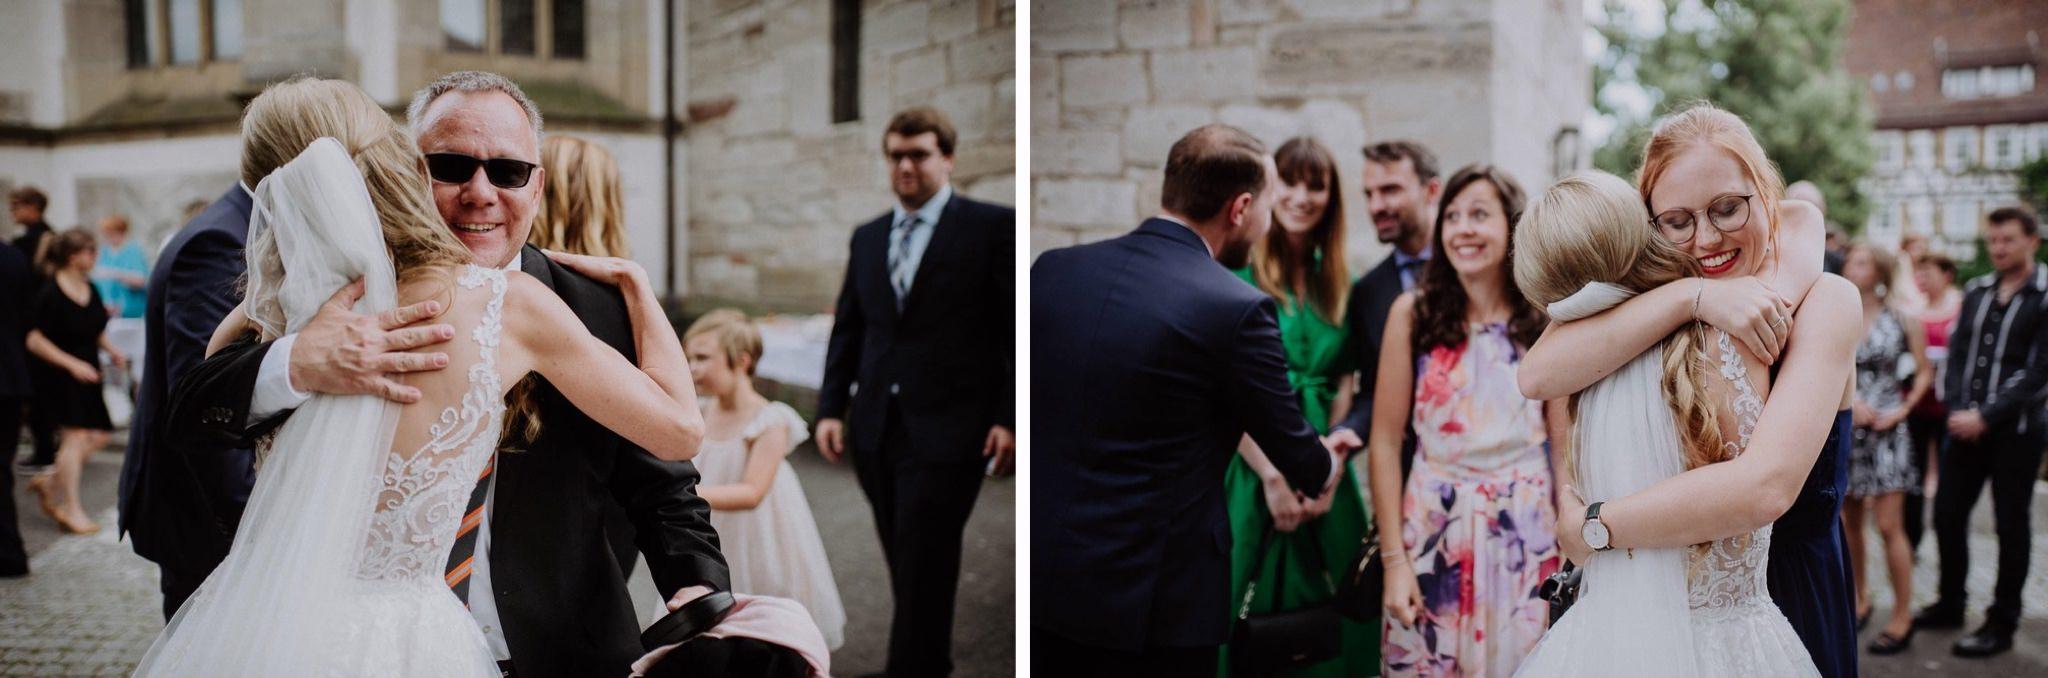 wedding photographer hamilton new zealand 1040